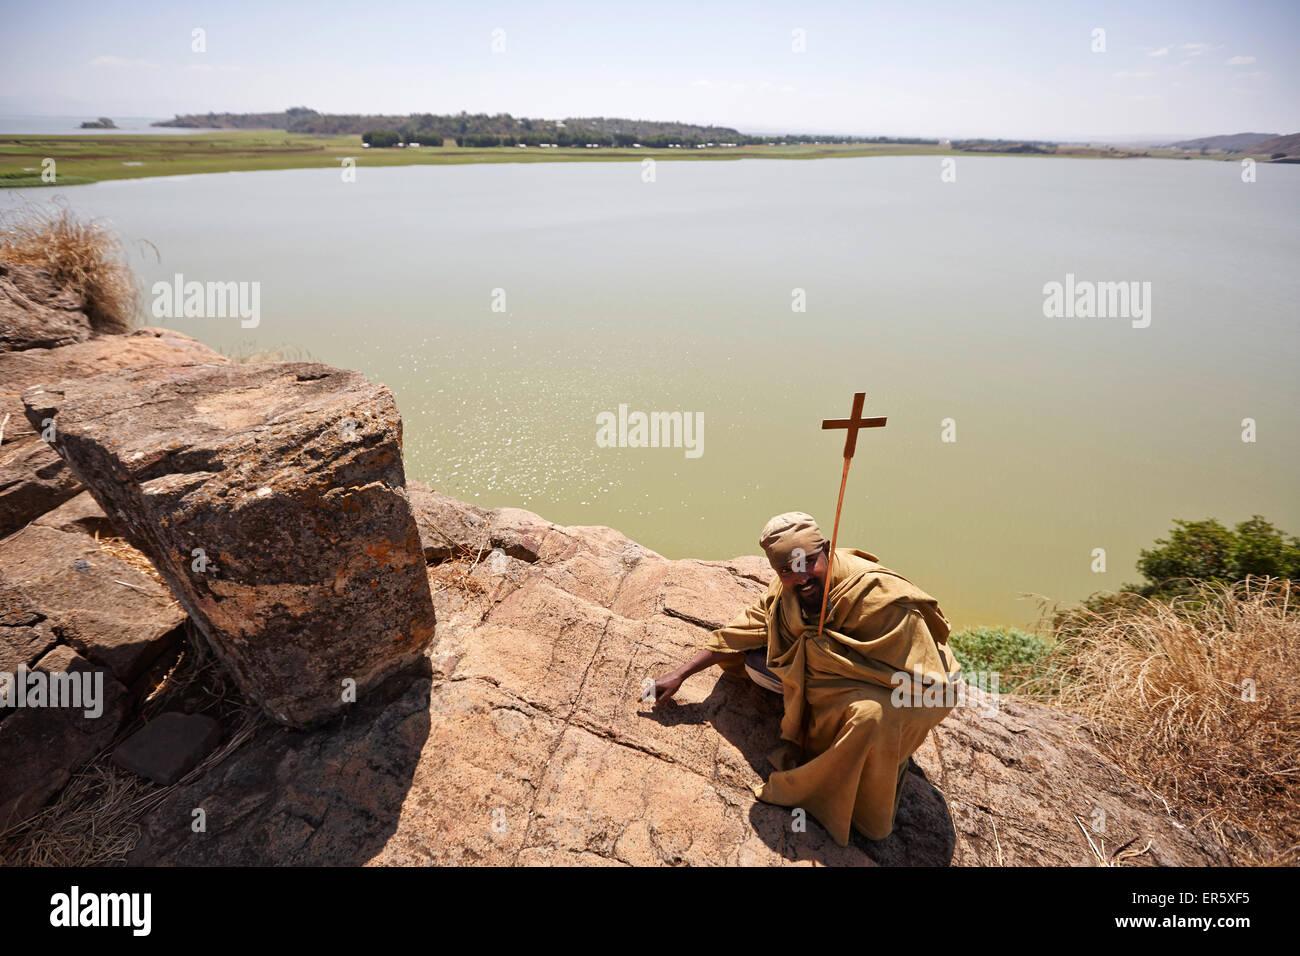 Monk crouching at resting place of Saint Mary, Tana Cherkos monastery island, Lake Tana, Amhara region, Ethiopia - Stock Image